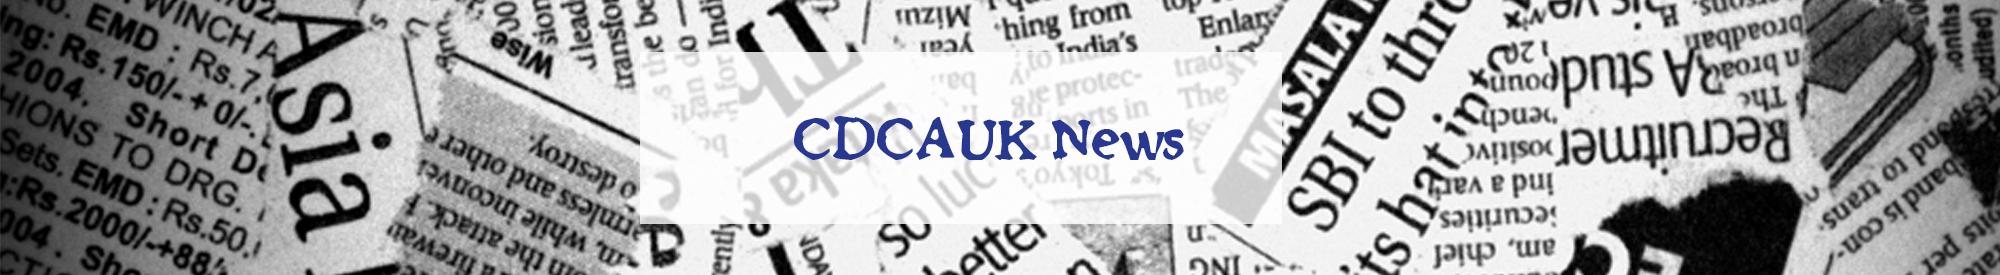 newspage1